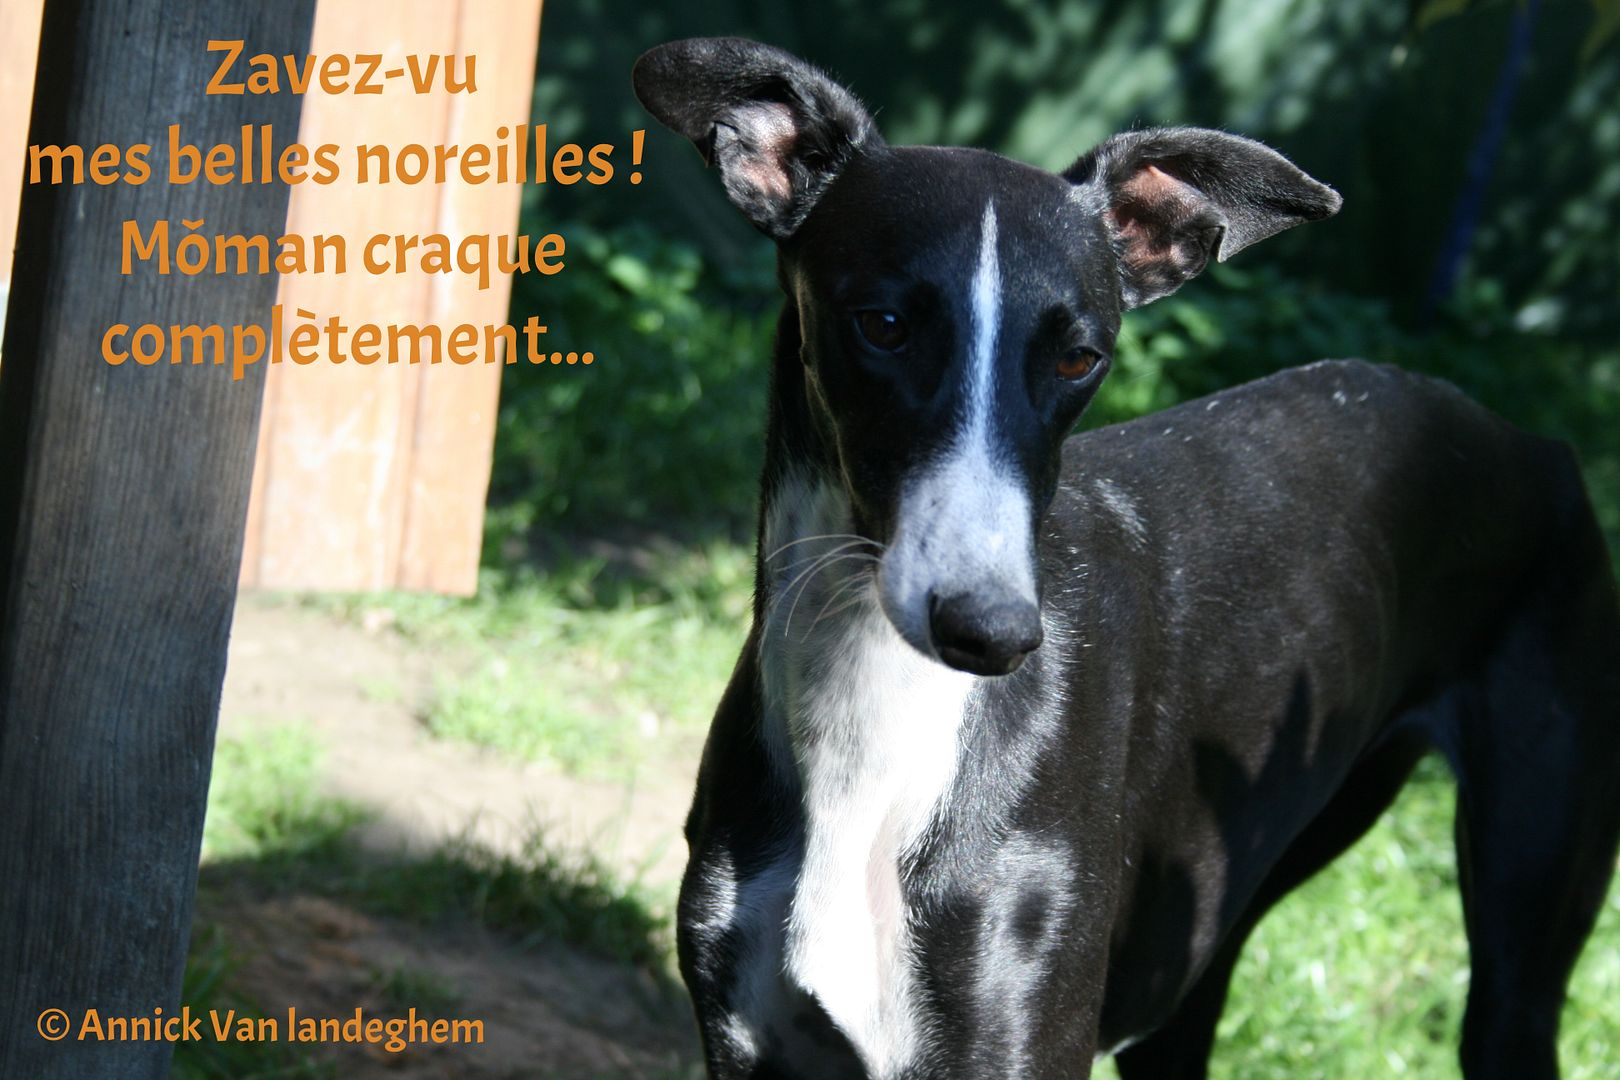 Natalia, galga noire et blanche, qui na pas 1 an  Scooby France Adoptée  - Page 4 33c68187-41af-4834-8299-2ee4ee1e0f86_zpsvyisqcek